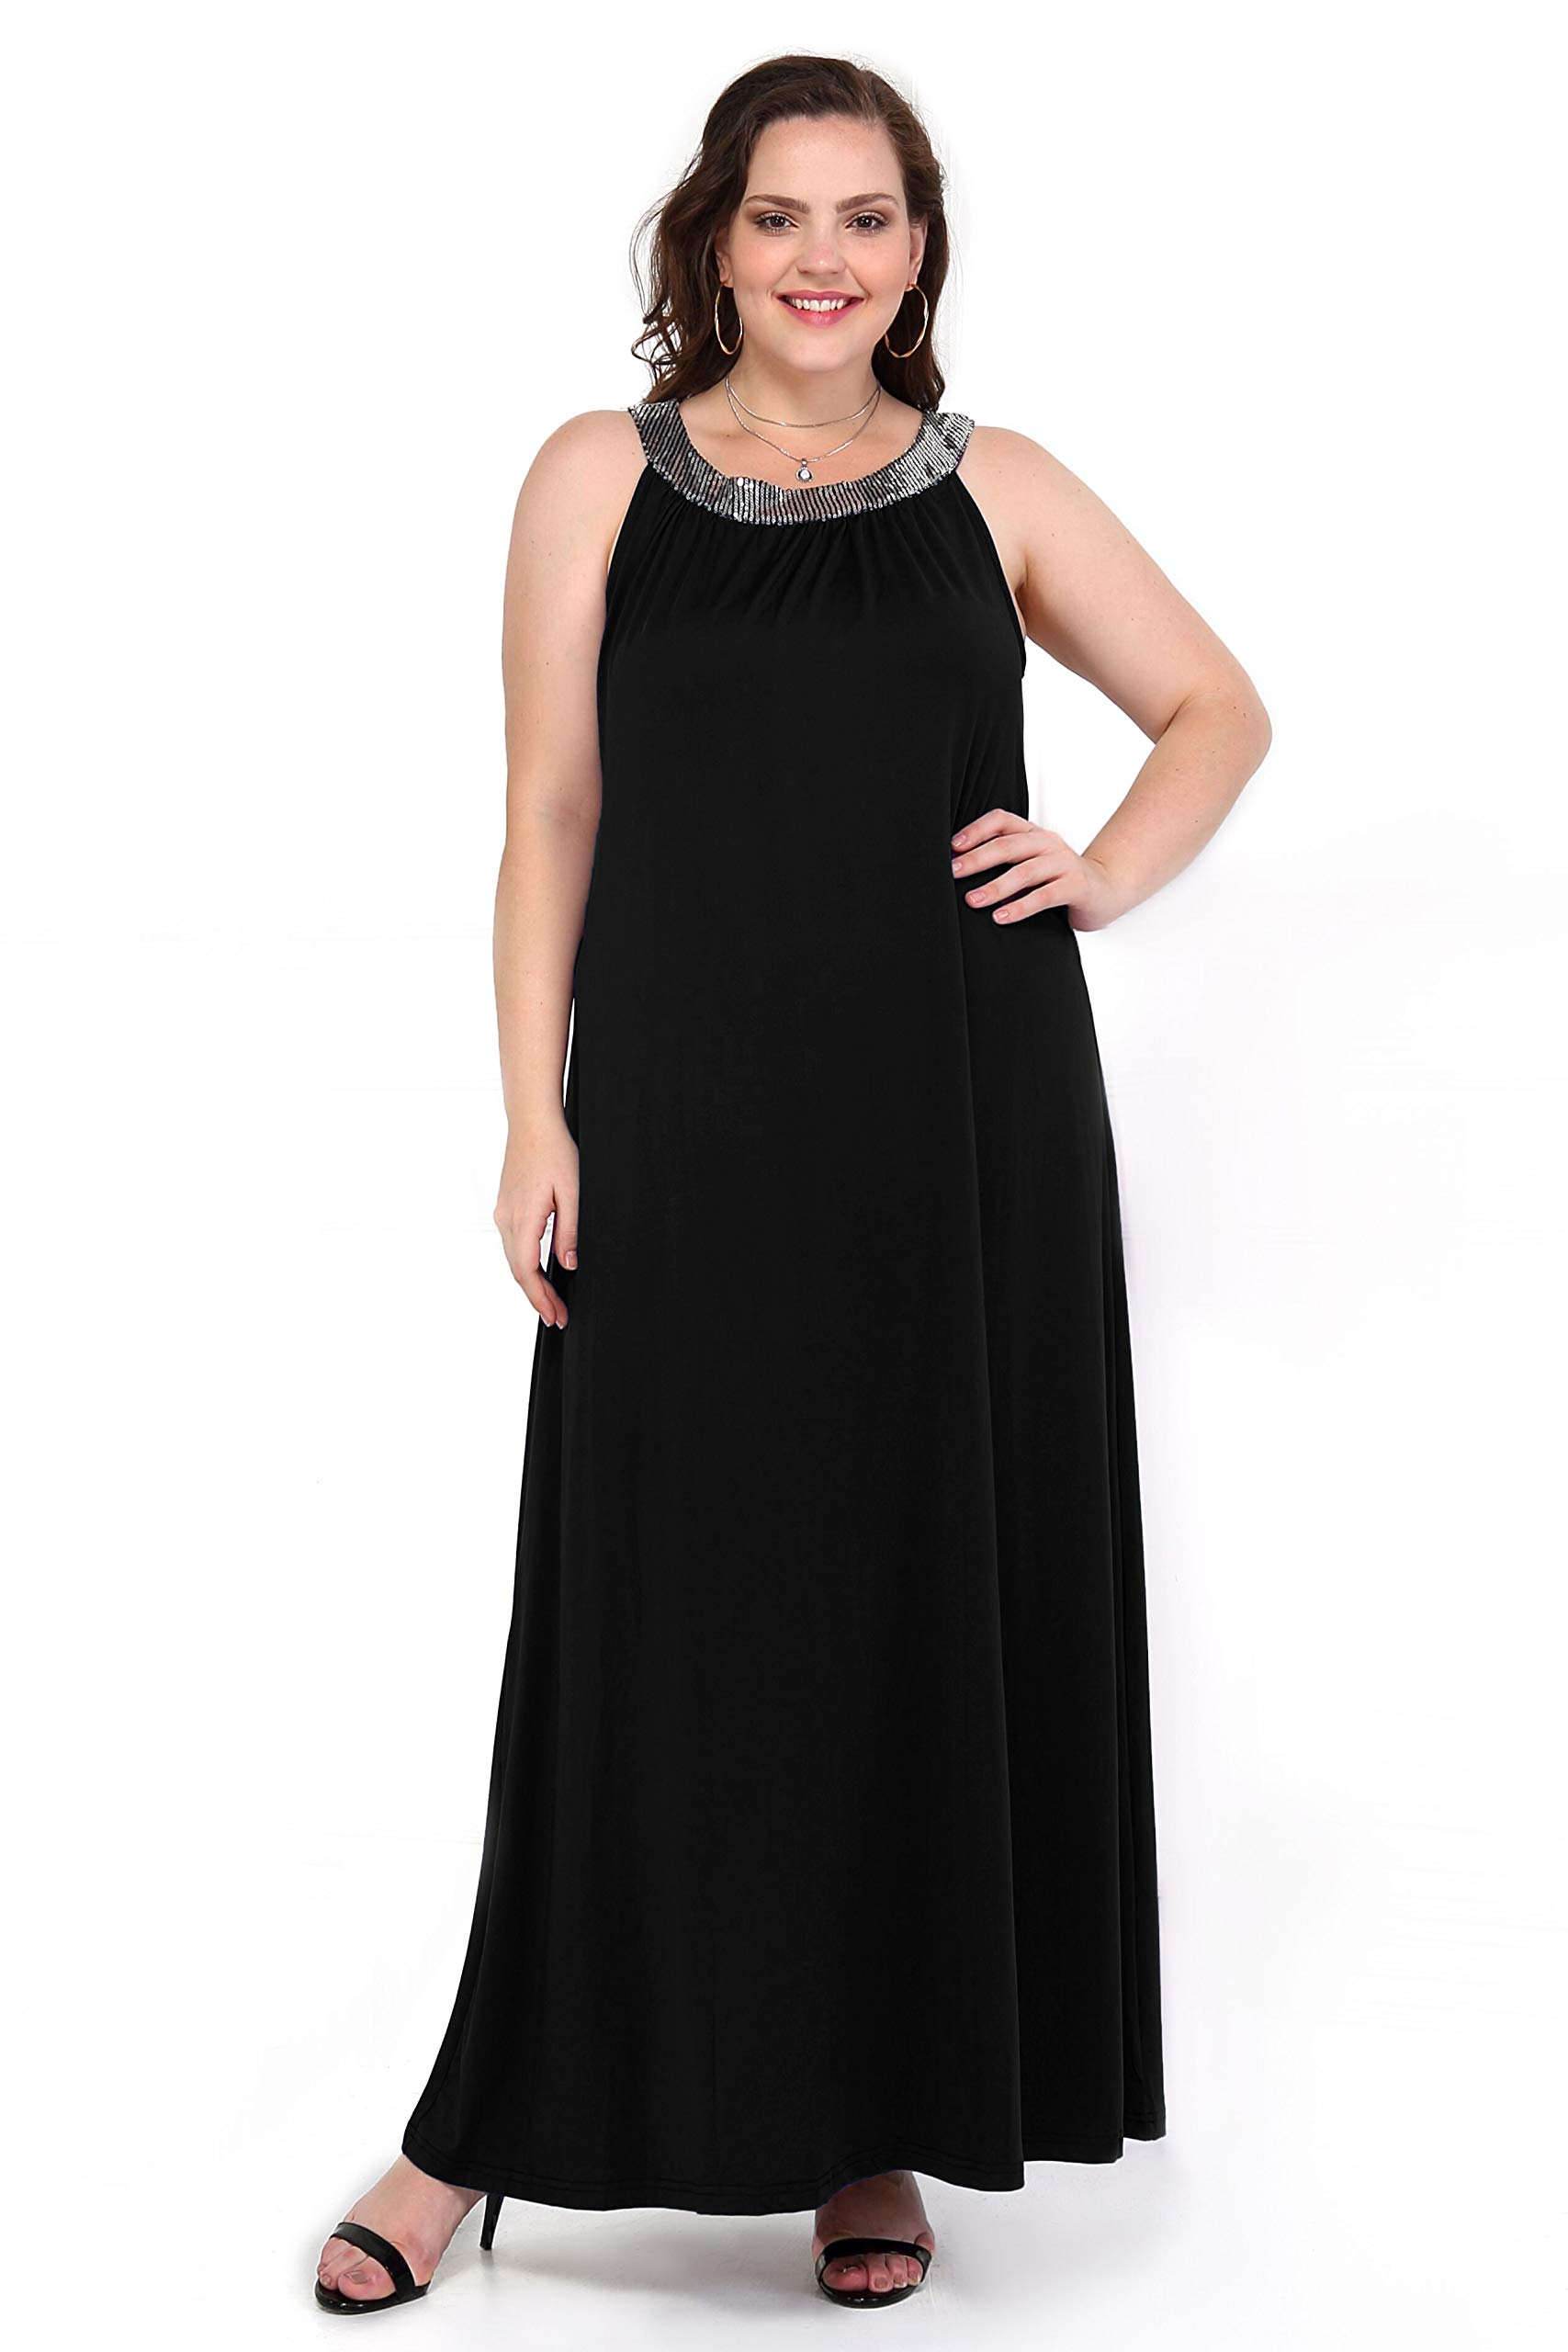 Queen's Here XXXL Womens Maxi Dresses Plus Size Sleeveless Racerback Party Wedding Long Dress (Black, XXXL) by Queen's Here